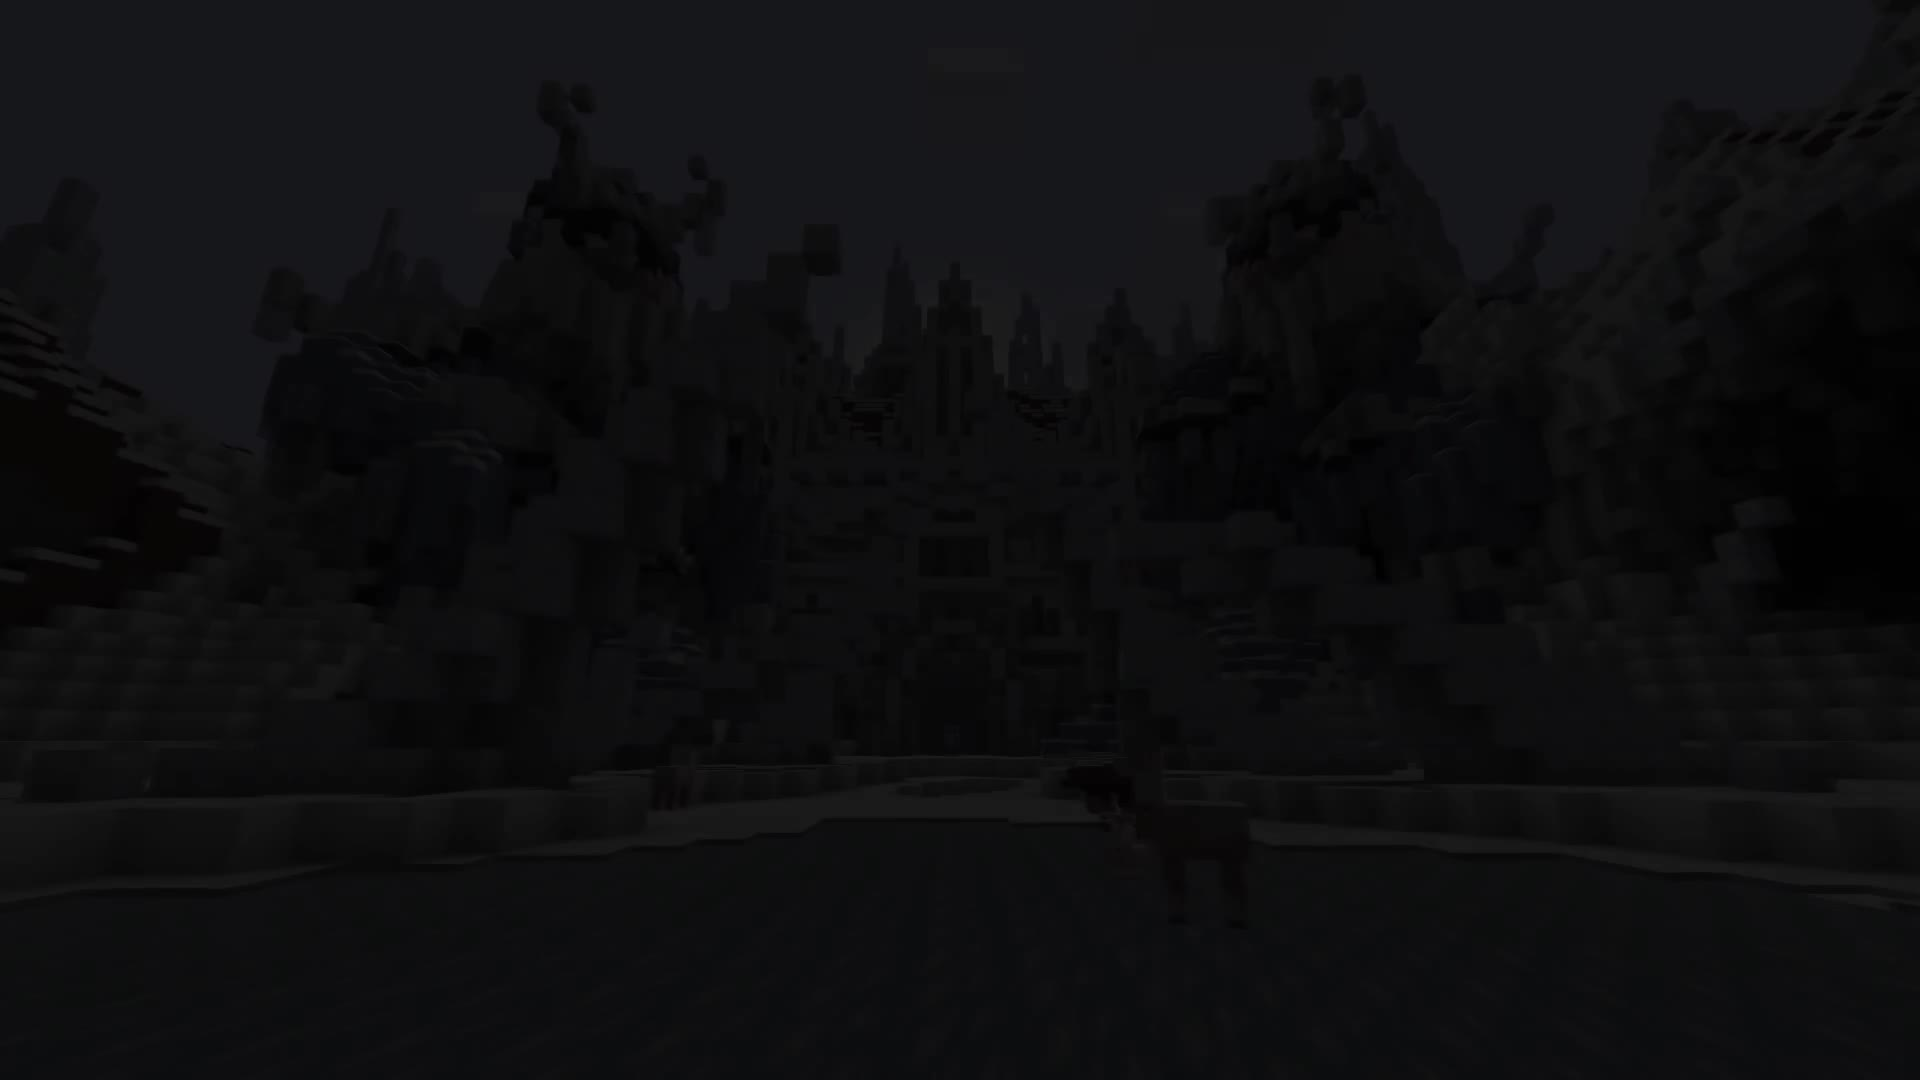 4J Studios, Microsoft, Minecraft, Minecraft Mash-Up Pack, Minecraft Nintendo Switch Edition, Minecraft PS4 Edition, Minecraft Xbox One Edition, Mojang, playerdotone, Minecraft Norse Mythology Mash-Up Pack Trailer GIFs